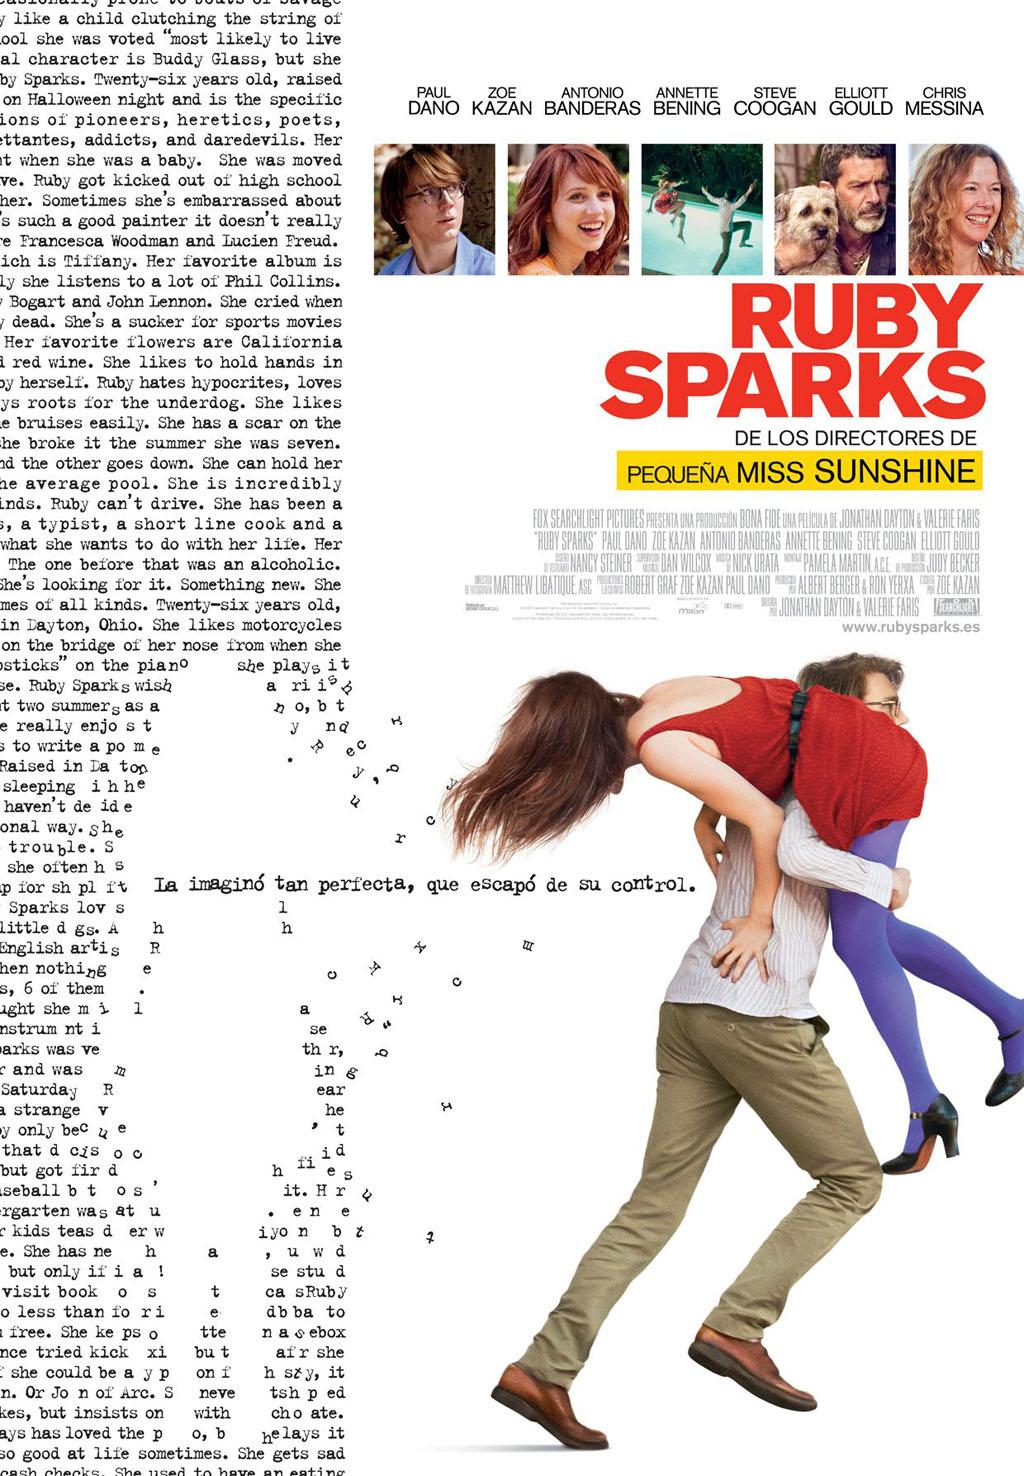 Cartel de Ruby Sparks